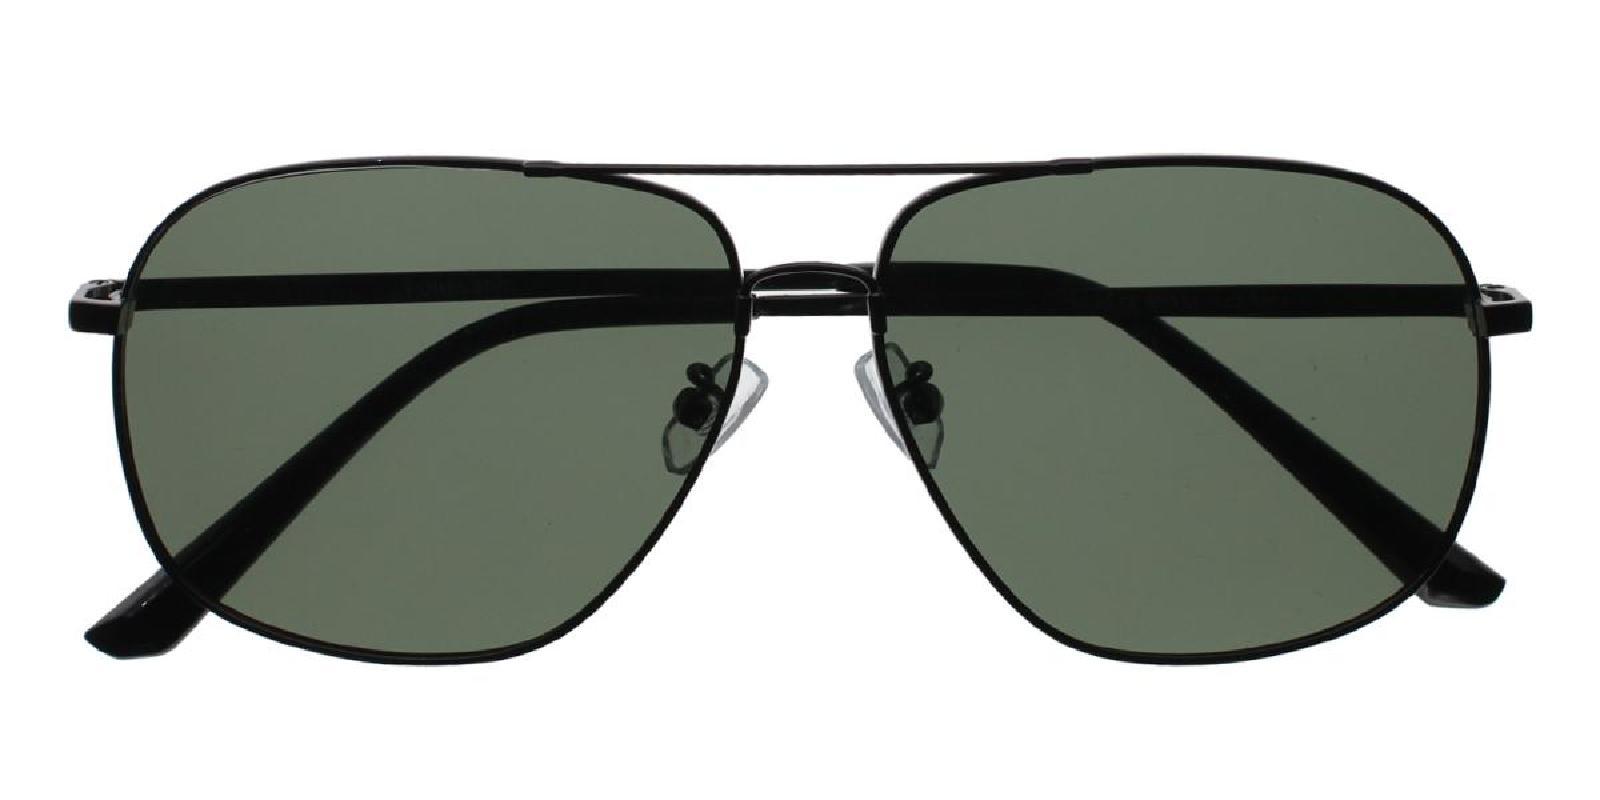 Flight-Gun-Aviator-Metal-Sunglasses-additional2